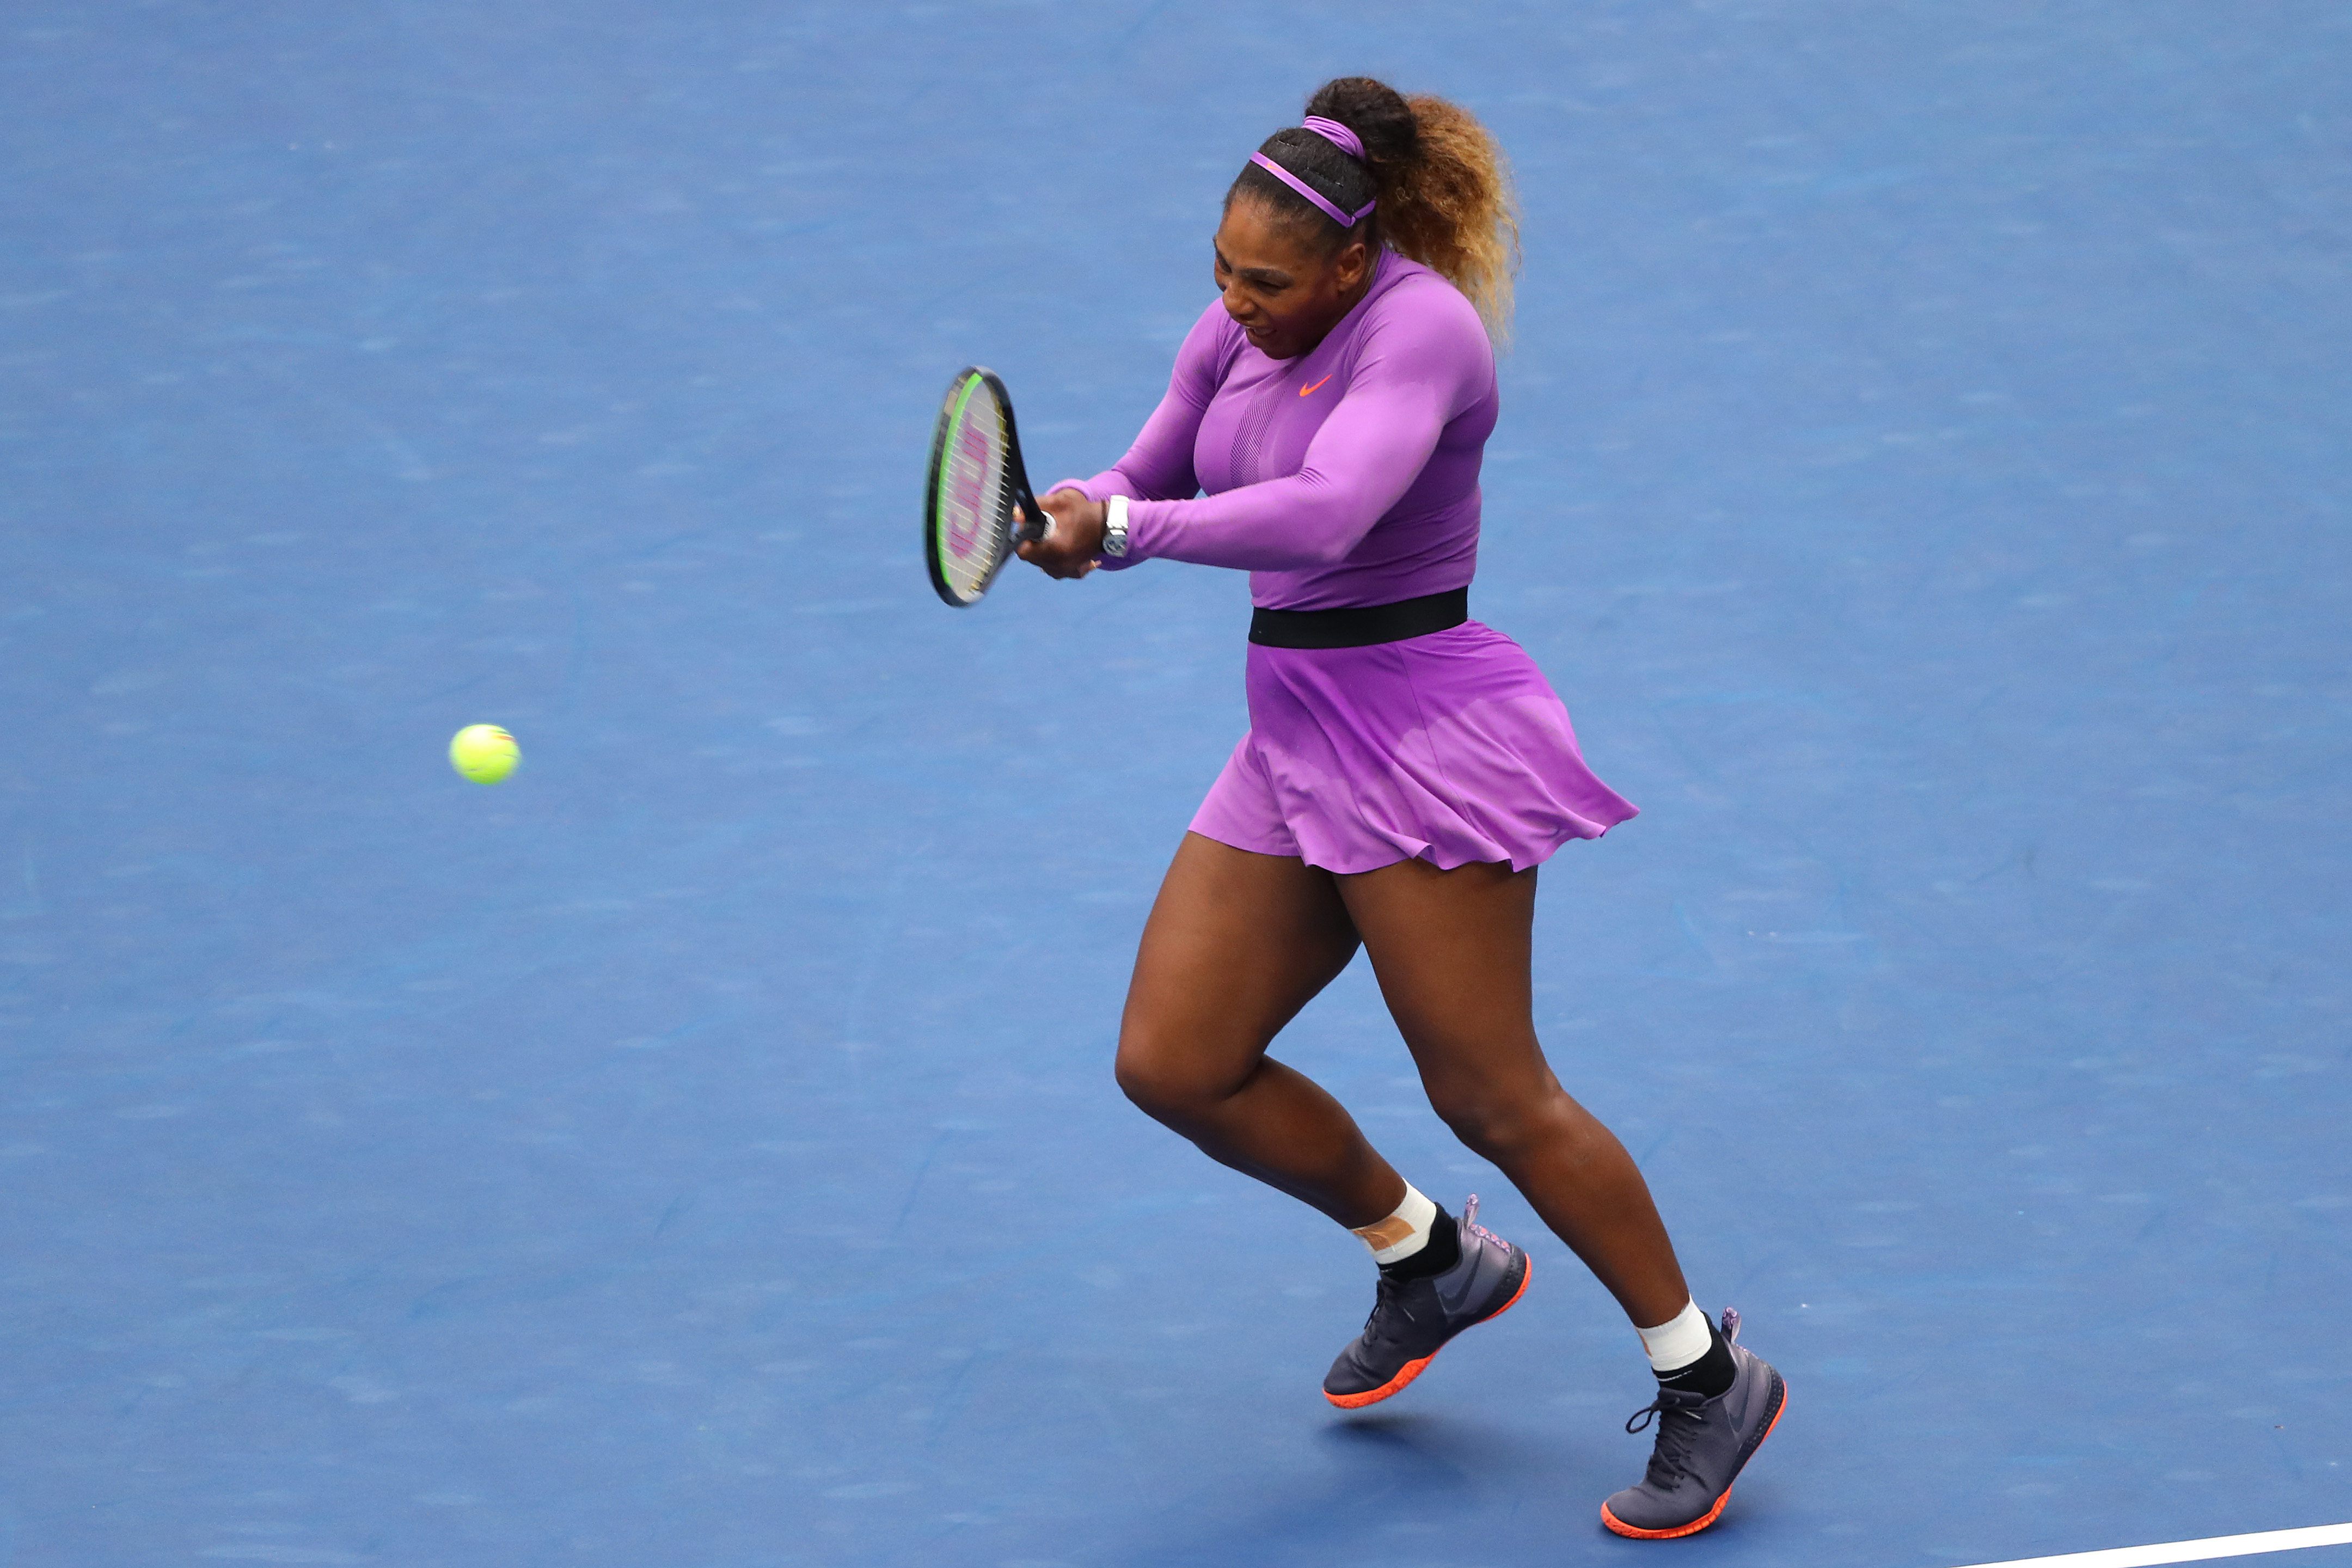 Serena Williams na final contra Bianca Andreescu no US Open (07/09/2019)